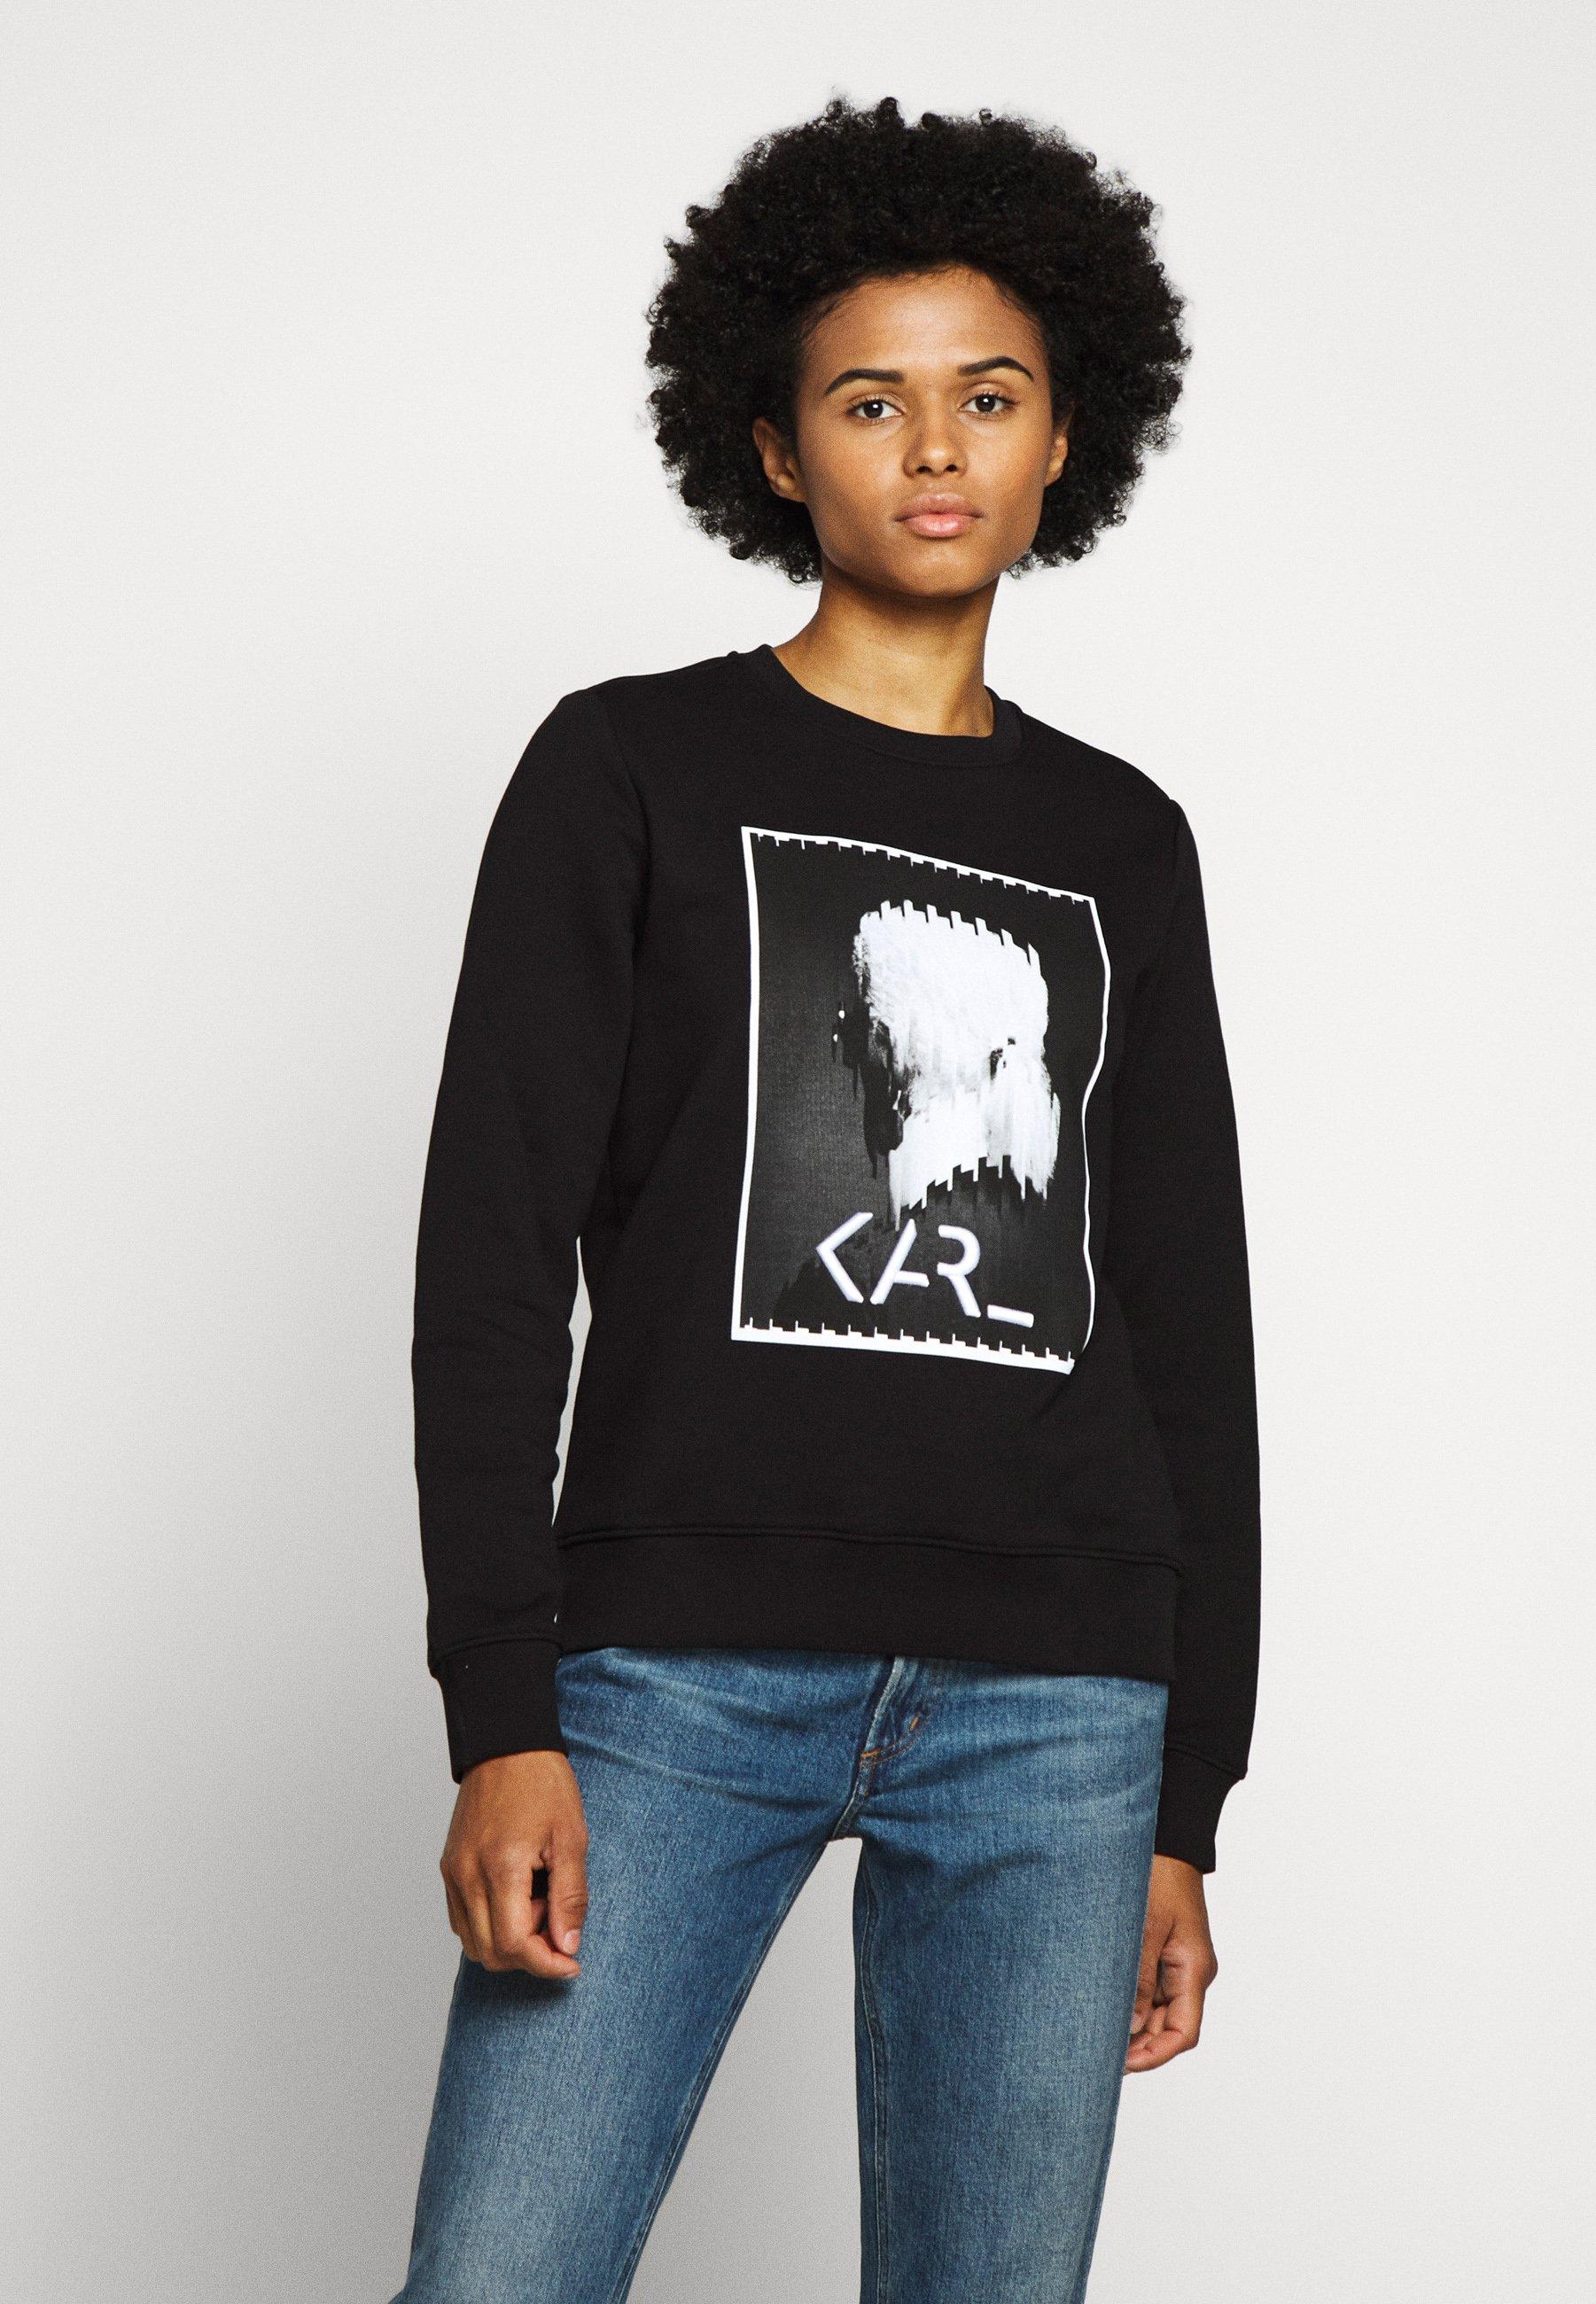 Factory Price Women's Clothing KARL LAGERFELD LEGEND PRINT Sweatshirt black tCoj1A8Ph